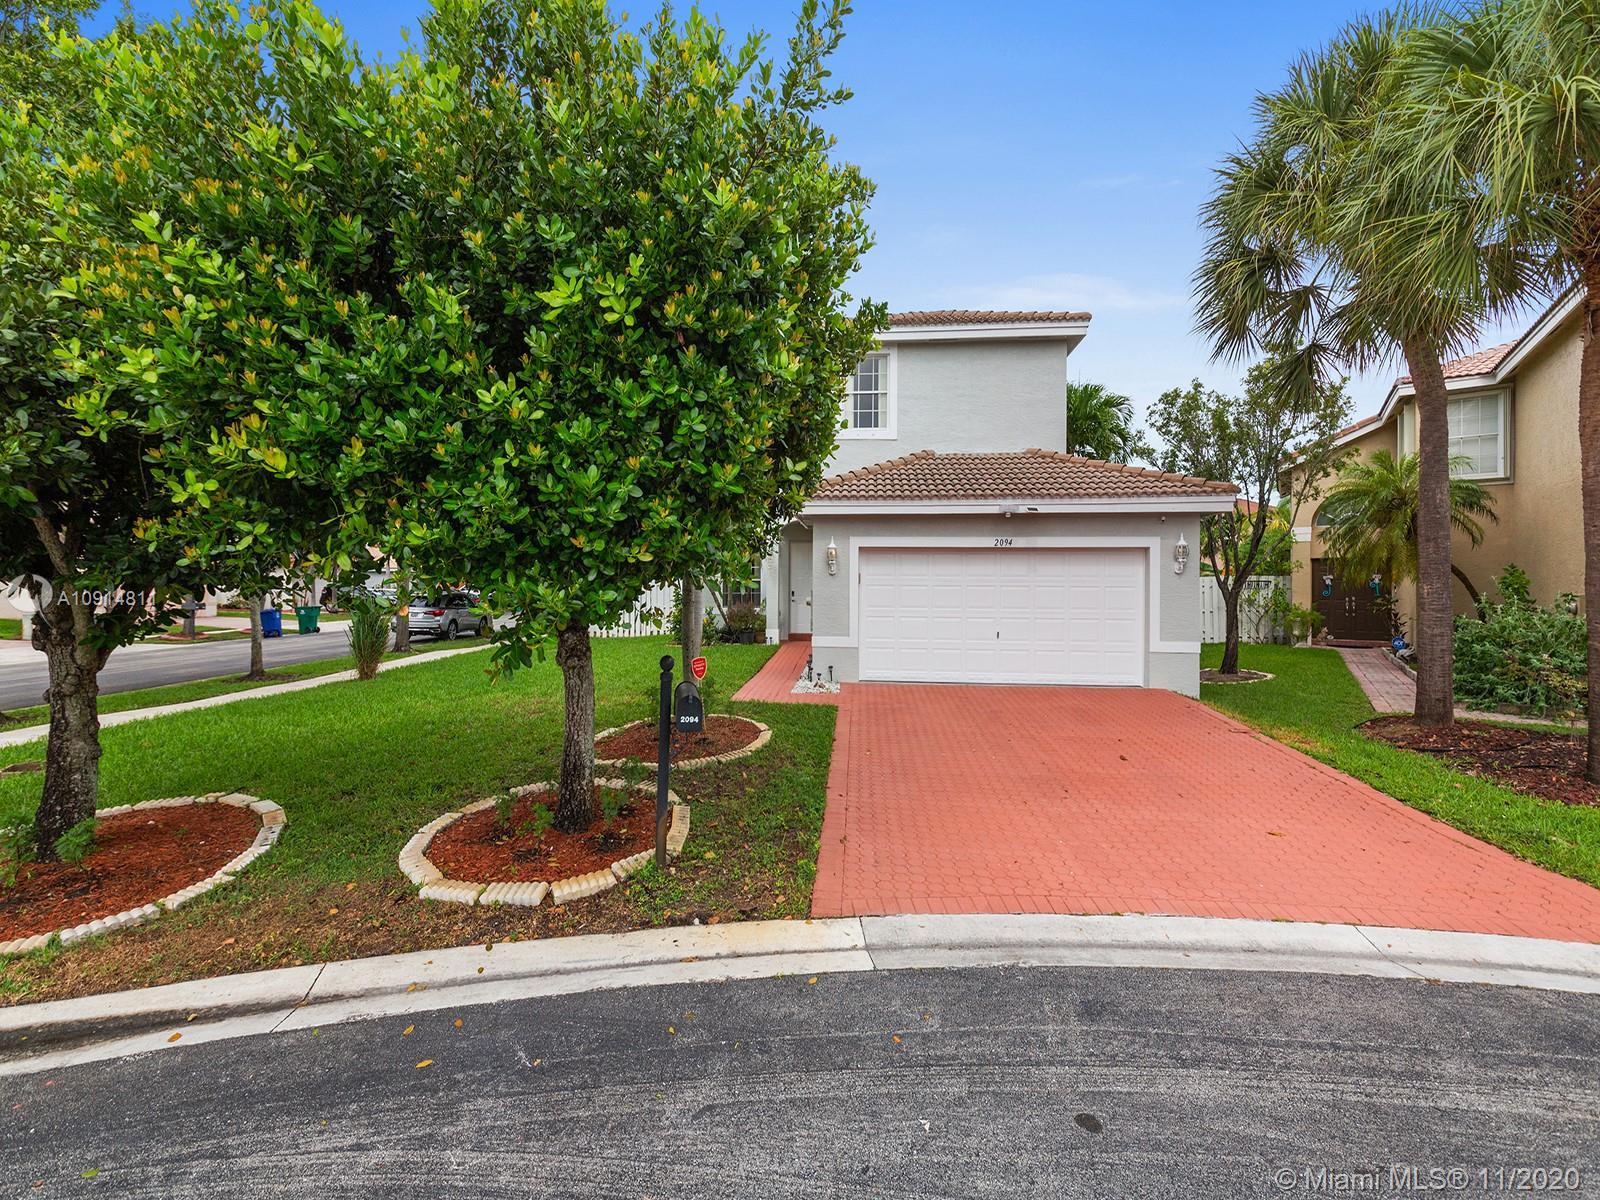 Silver Shores - 2094 SW 158th Ave, Miramar, FL 33027